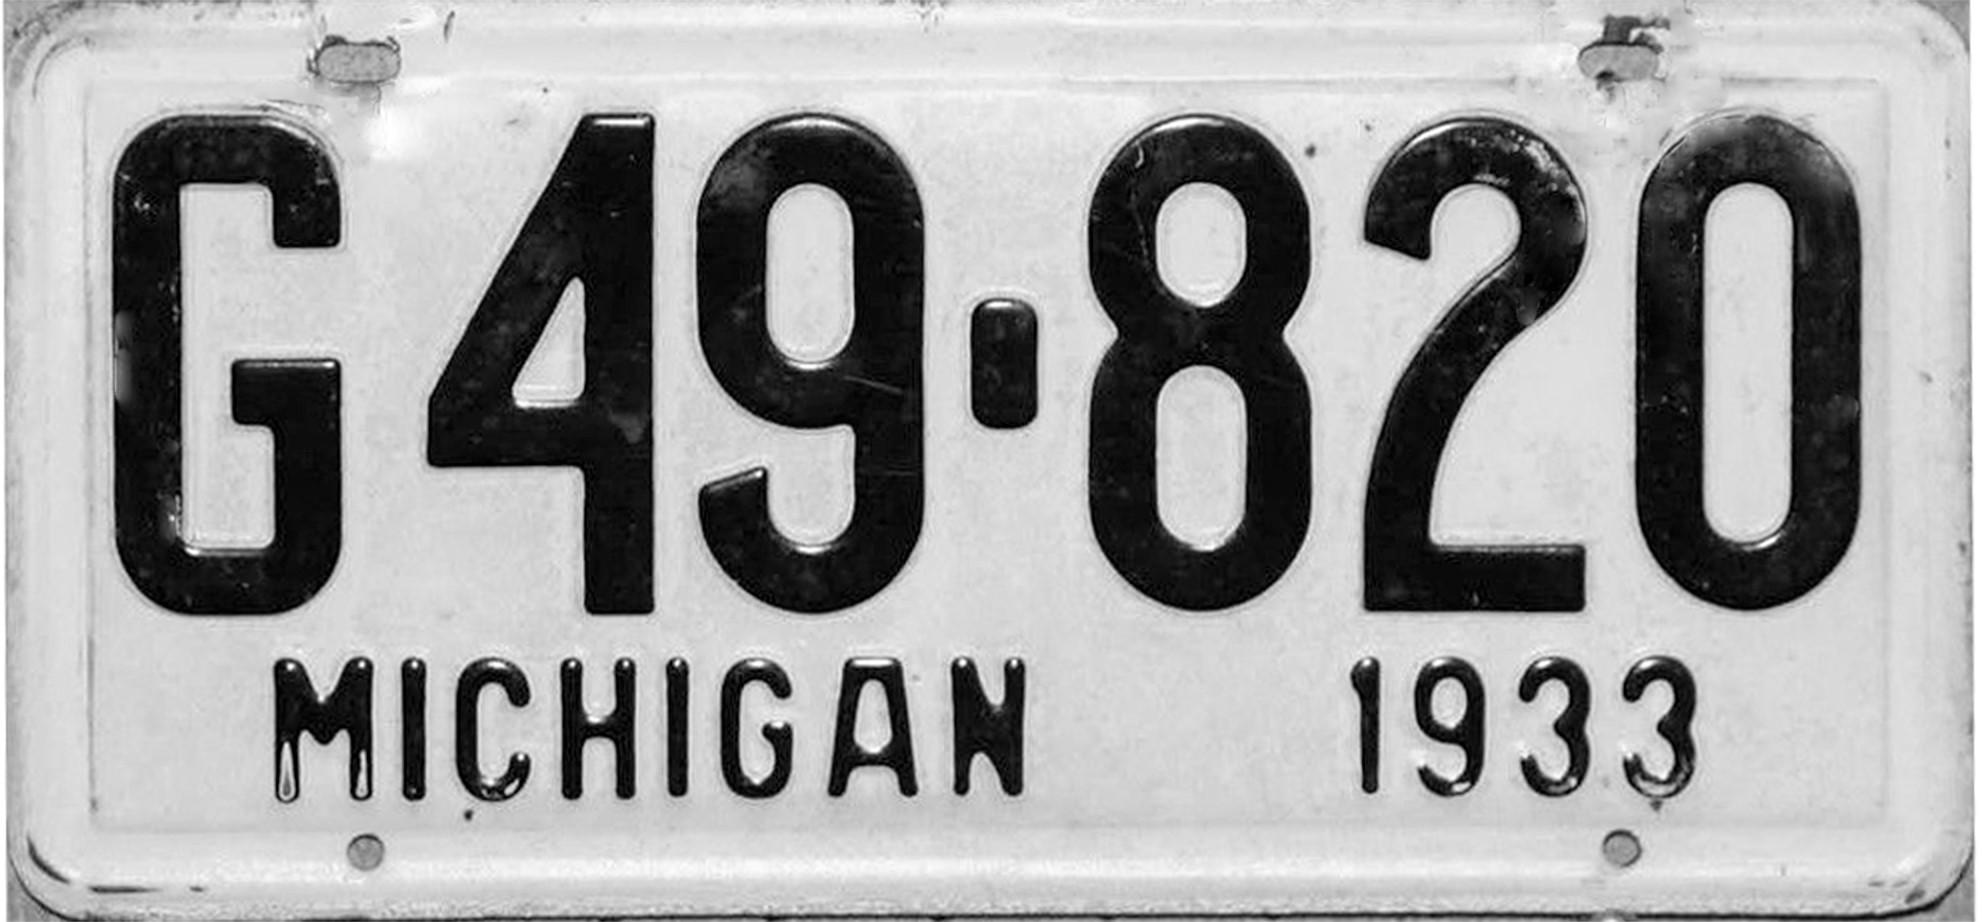 File:1933 Michigan license plate.jpg - Wikimedia Commons